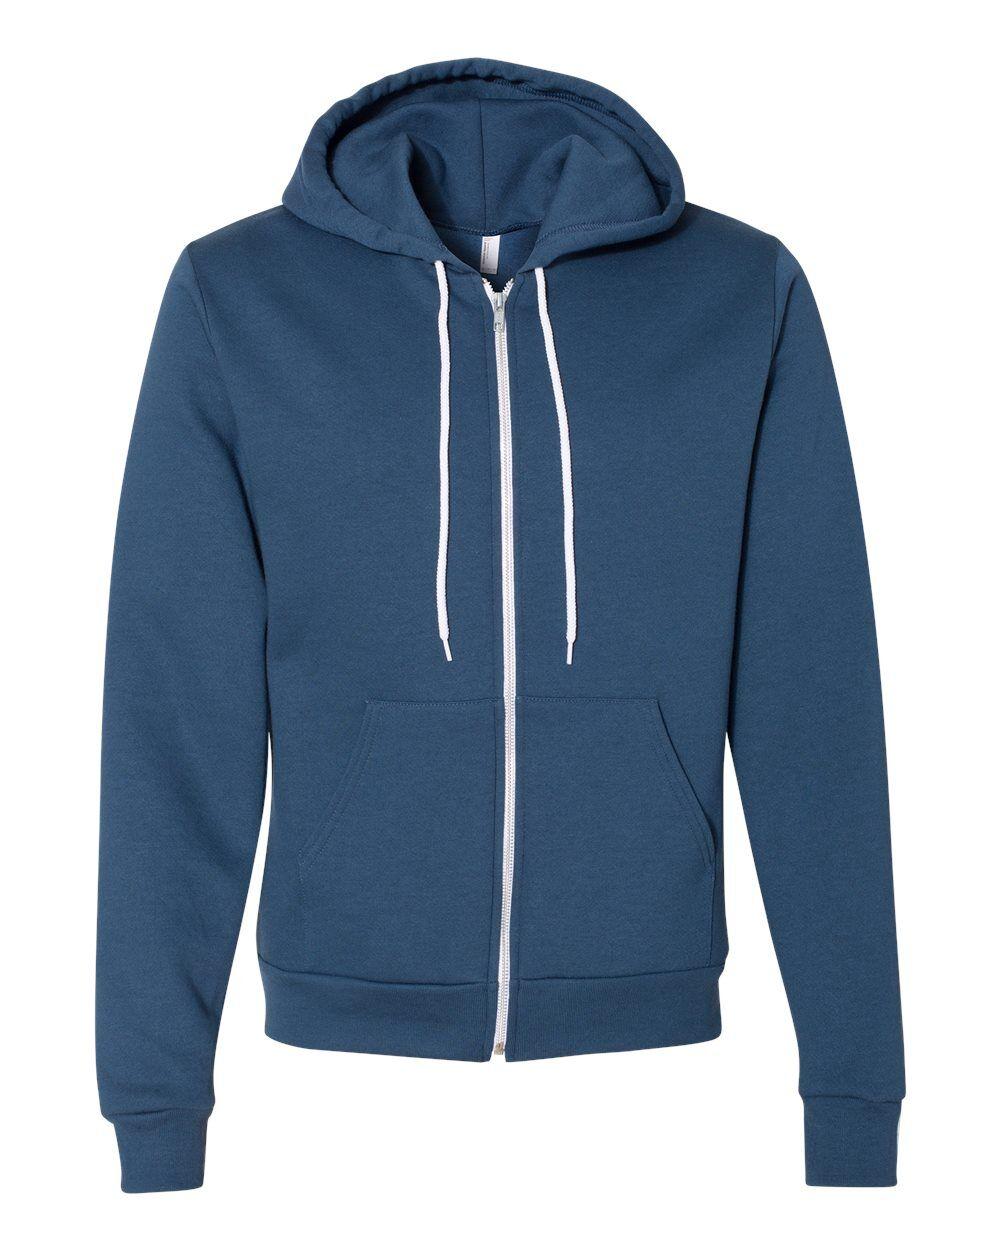 American Apparel - USA-Made Flex Fleece Unisex Full-Zip Hoodie - F497US - Sea Blue - Small